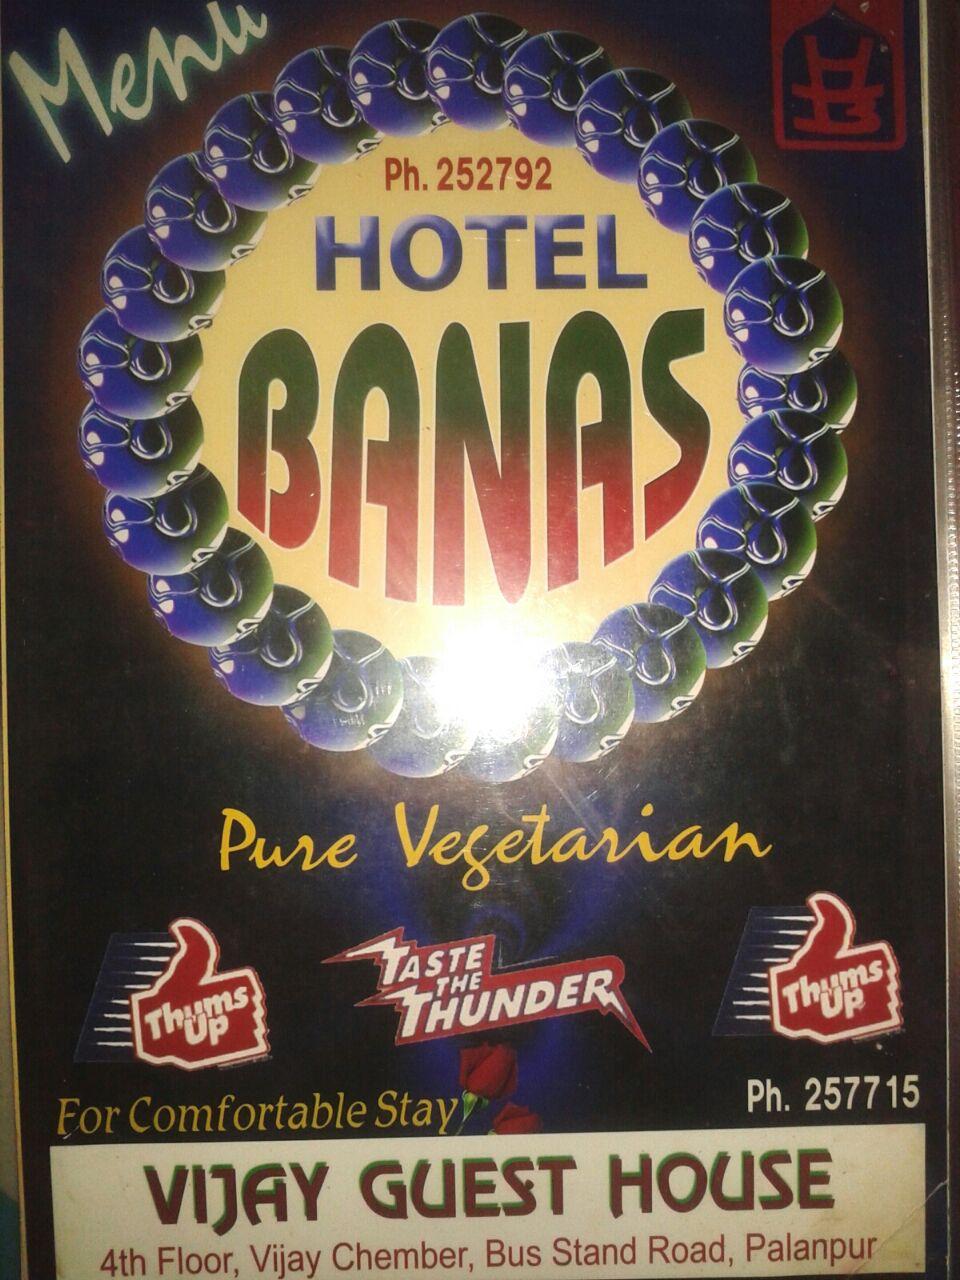 Hotel Banas & Vijay Guest House